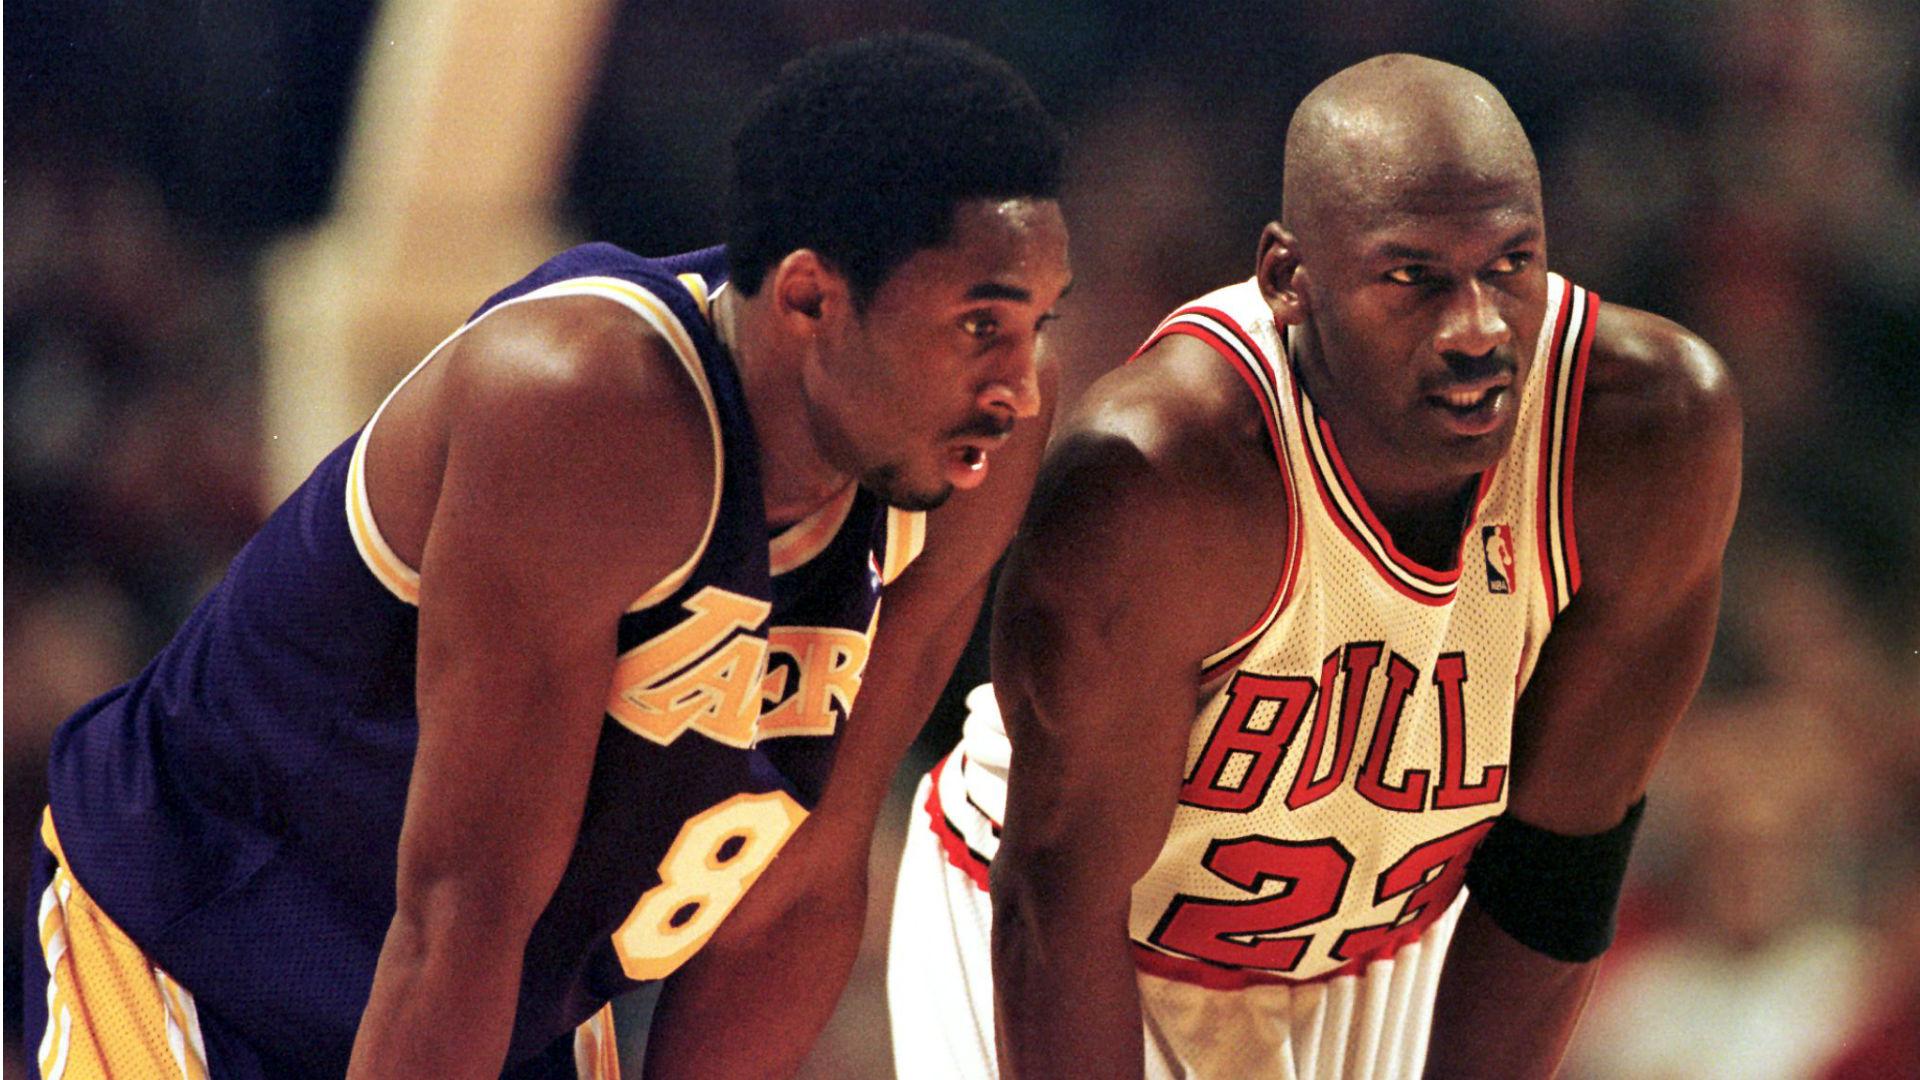 Michael Jordan will present Kobe Bryant at the Naismith Memorial Basketball Hall of Fame